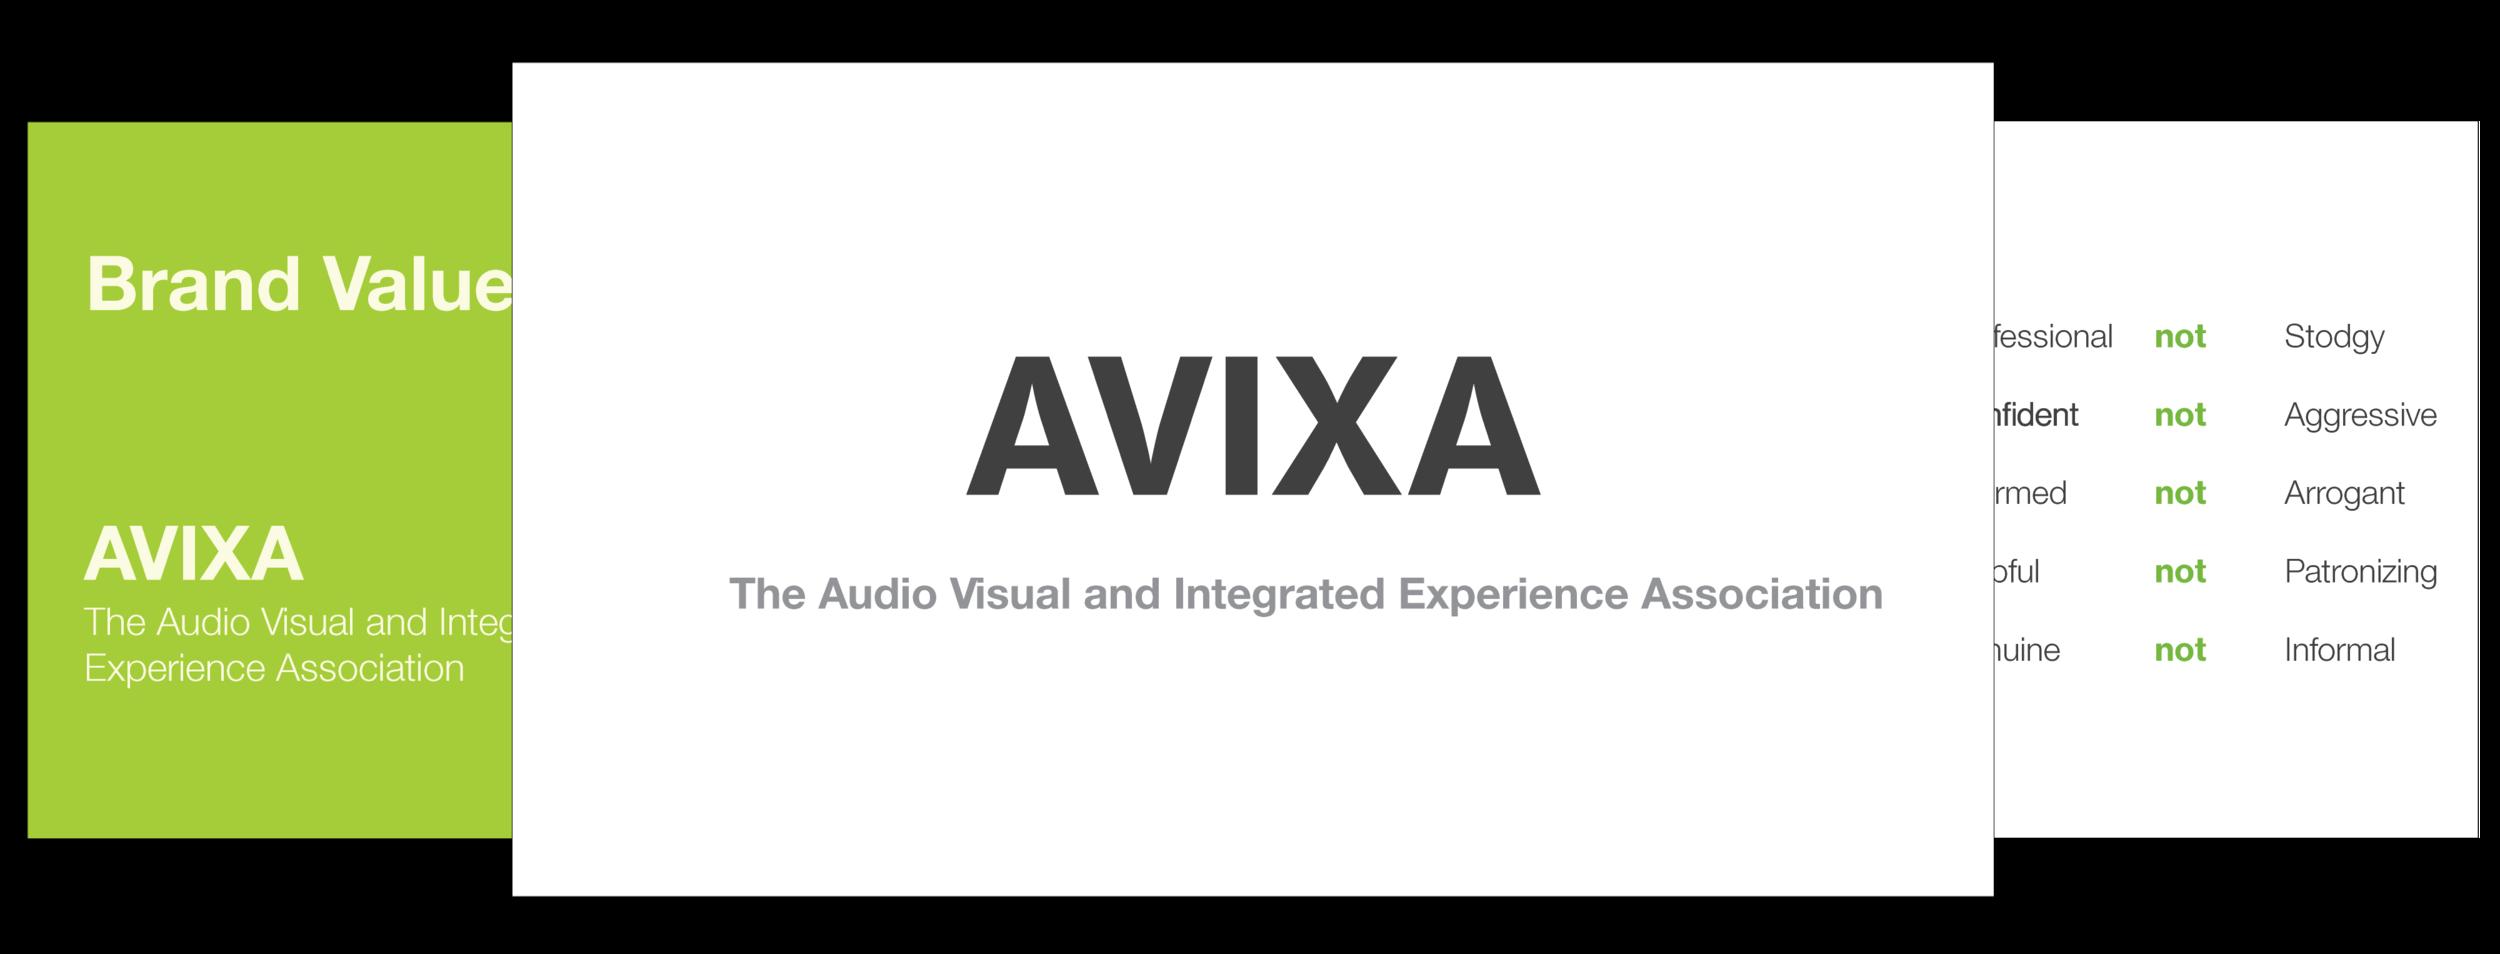 avixa-strategy_deck-a.png